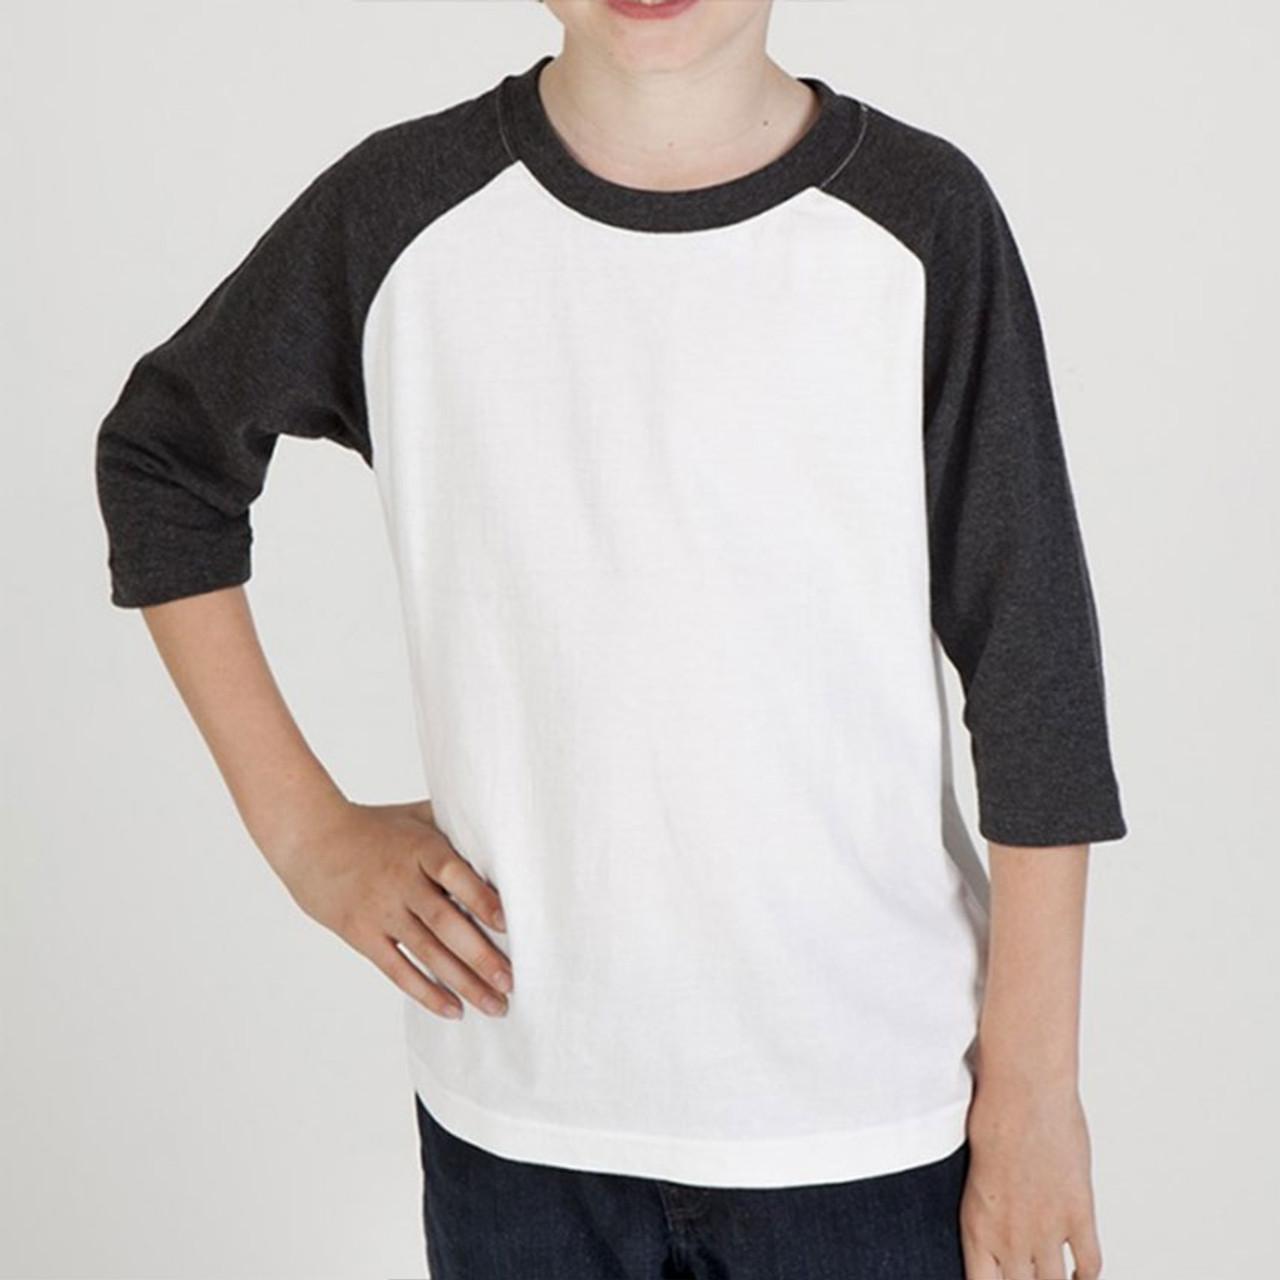 a640e33c MARTY | kids baseball t-shirts 3/4 sleeves | Plain T Shirts | Wholesale T  Shirts